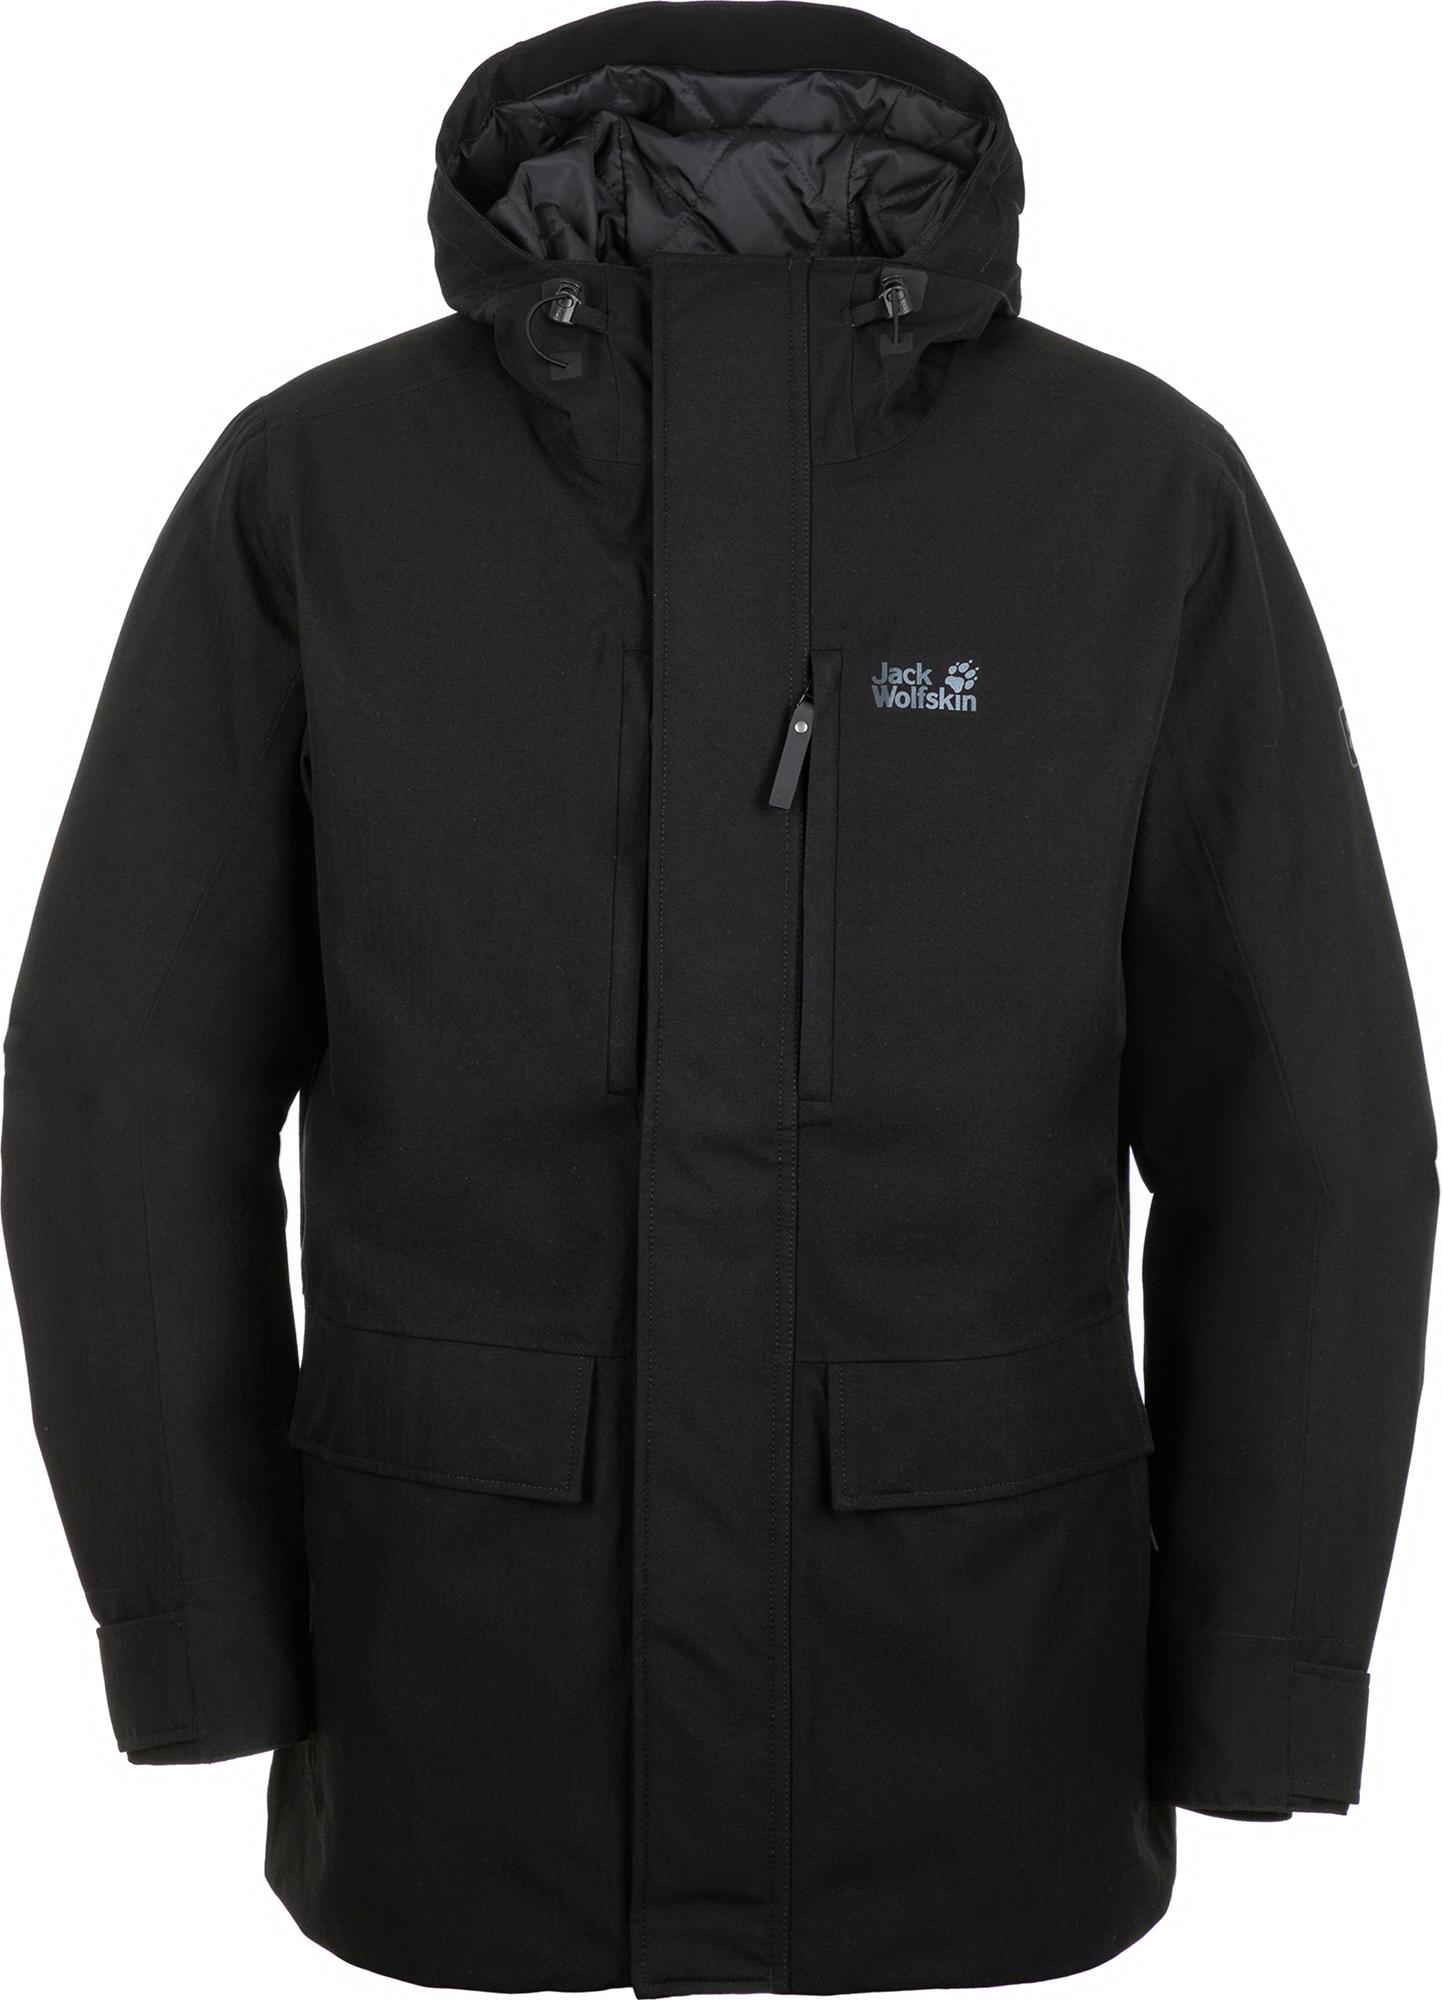 JACK WOLFSKIN Куртка утепленная мужская Jack Wolfskin West Coast, размер 44